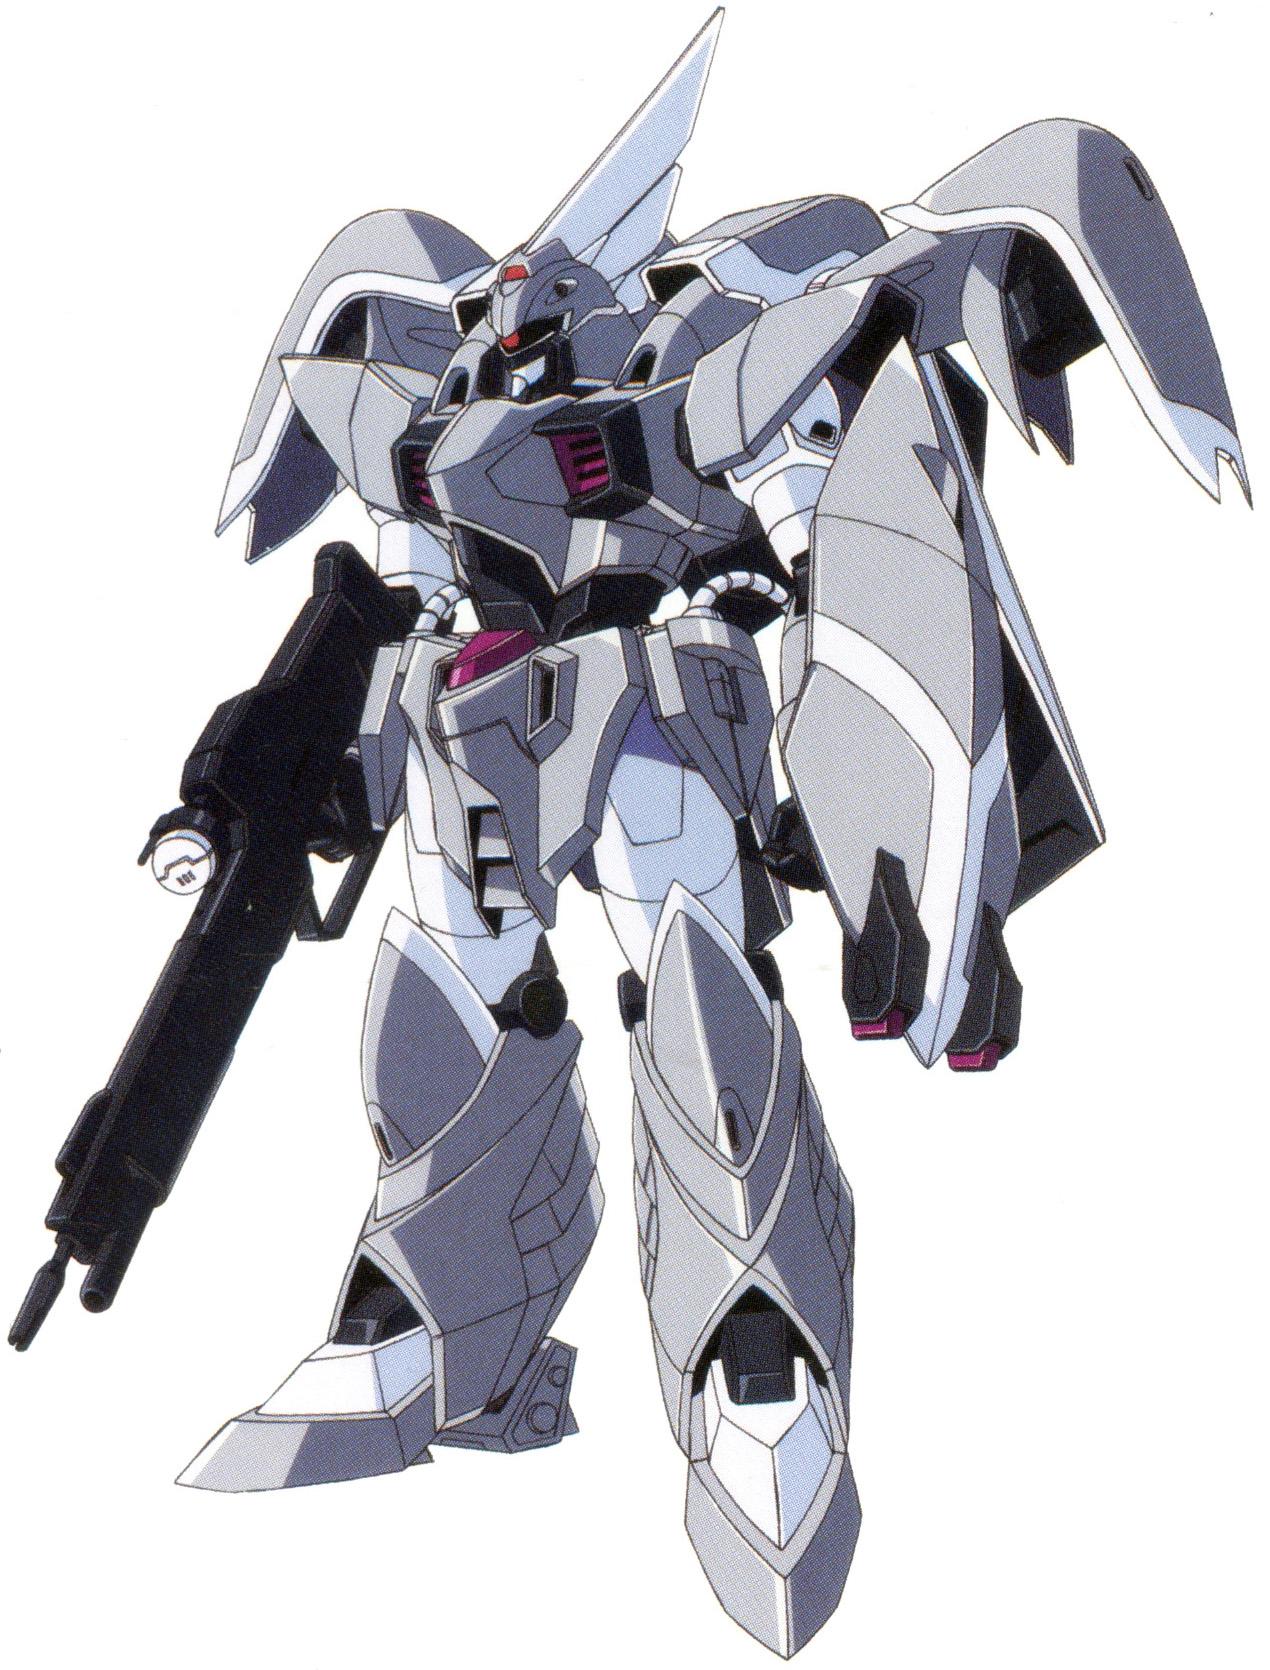 File:Zgmf-600-commander.jpg